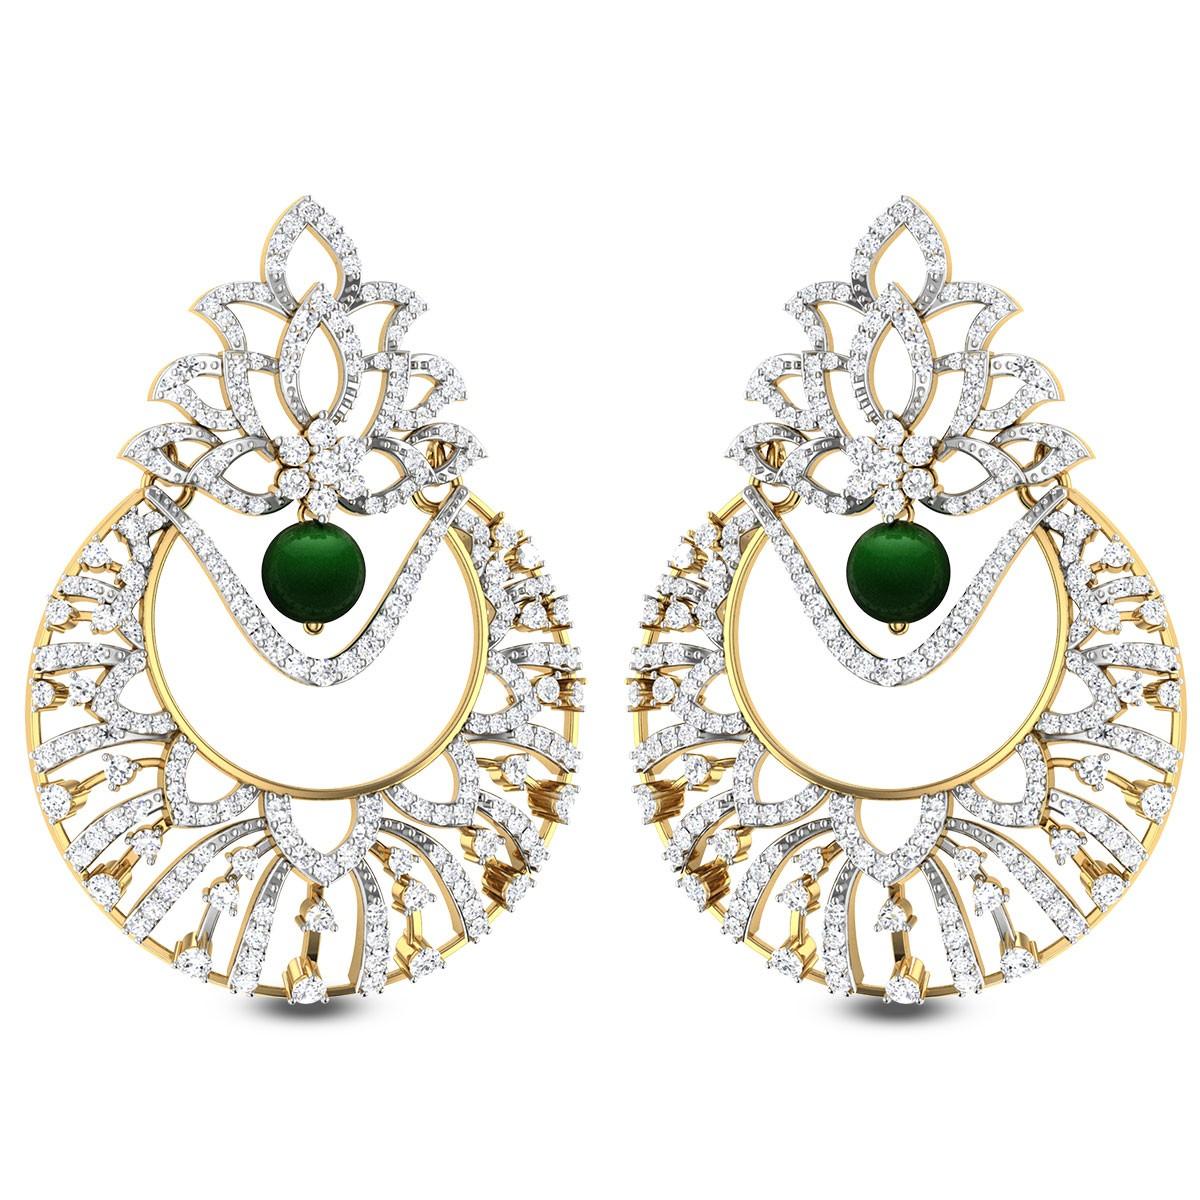 Triteleia Diamond Earrings